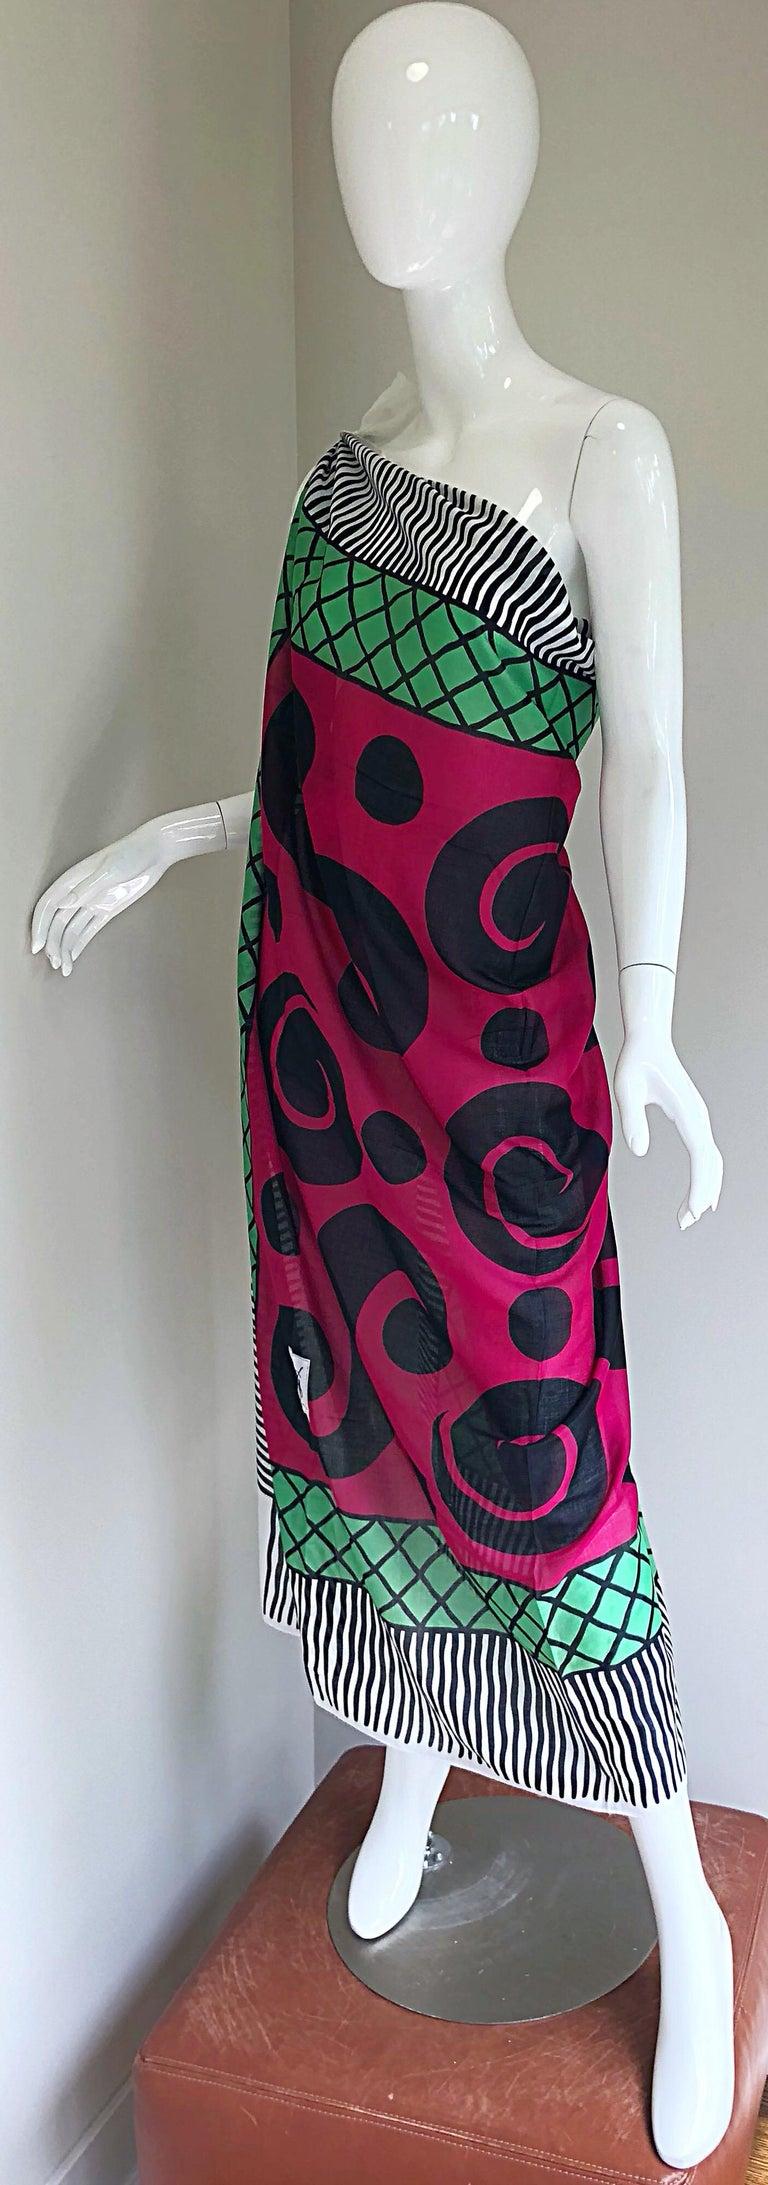 Vintage Yves Saint Laurent Iconic YSL Jumbo 55 x 55 Cotton Shawl Parero Dress For Sale 1